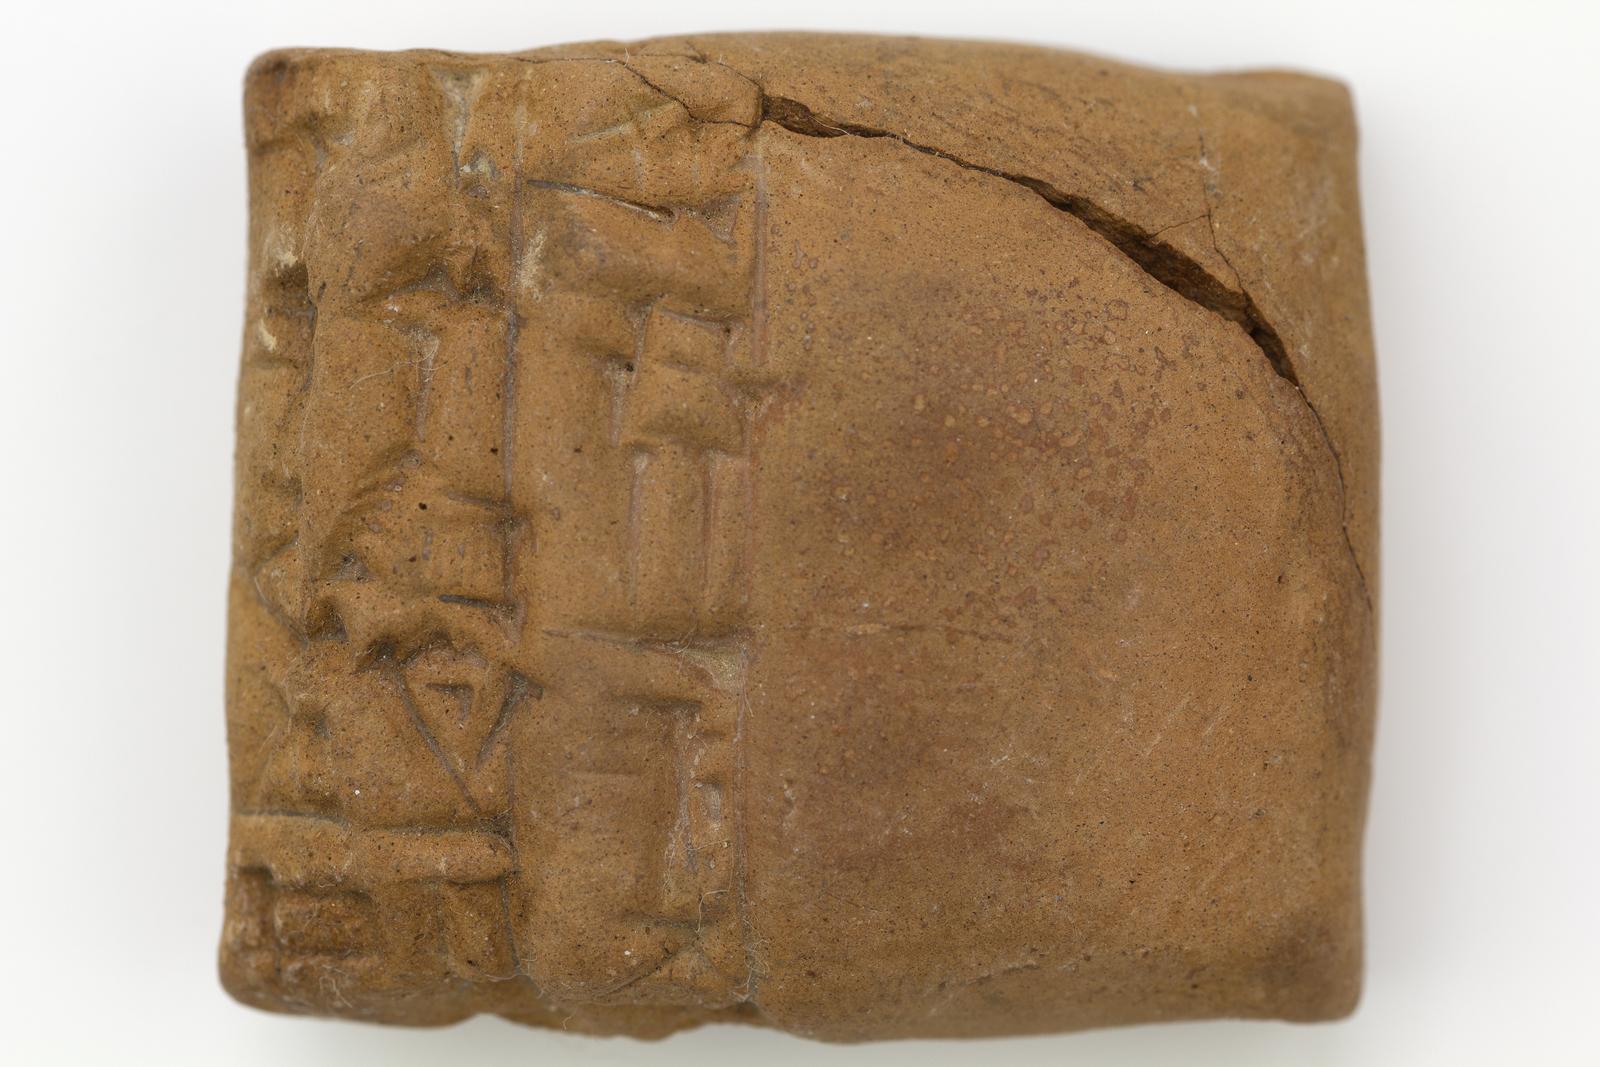 Clay cuneiform tablet